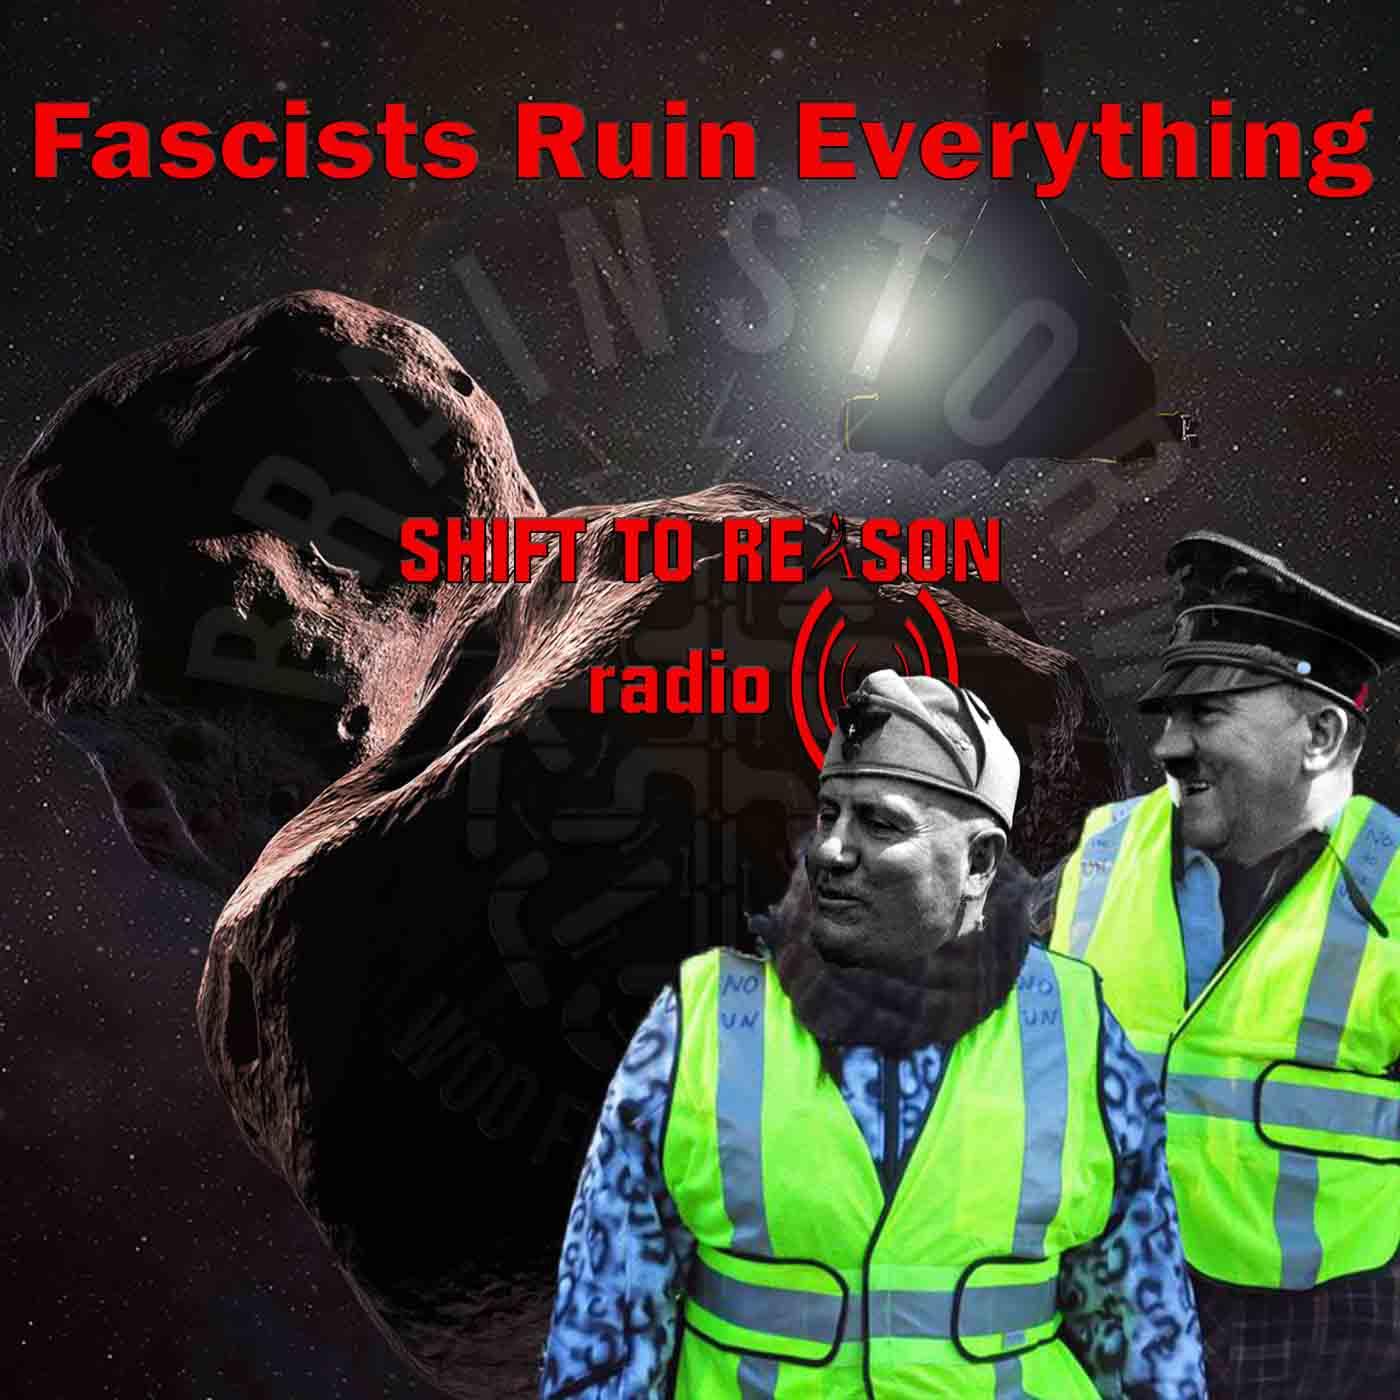 fascists square.jpg